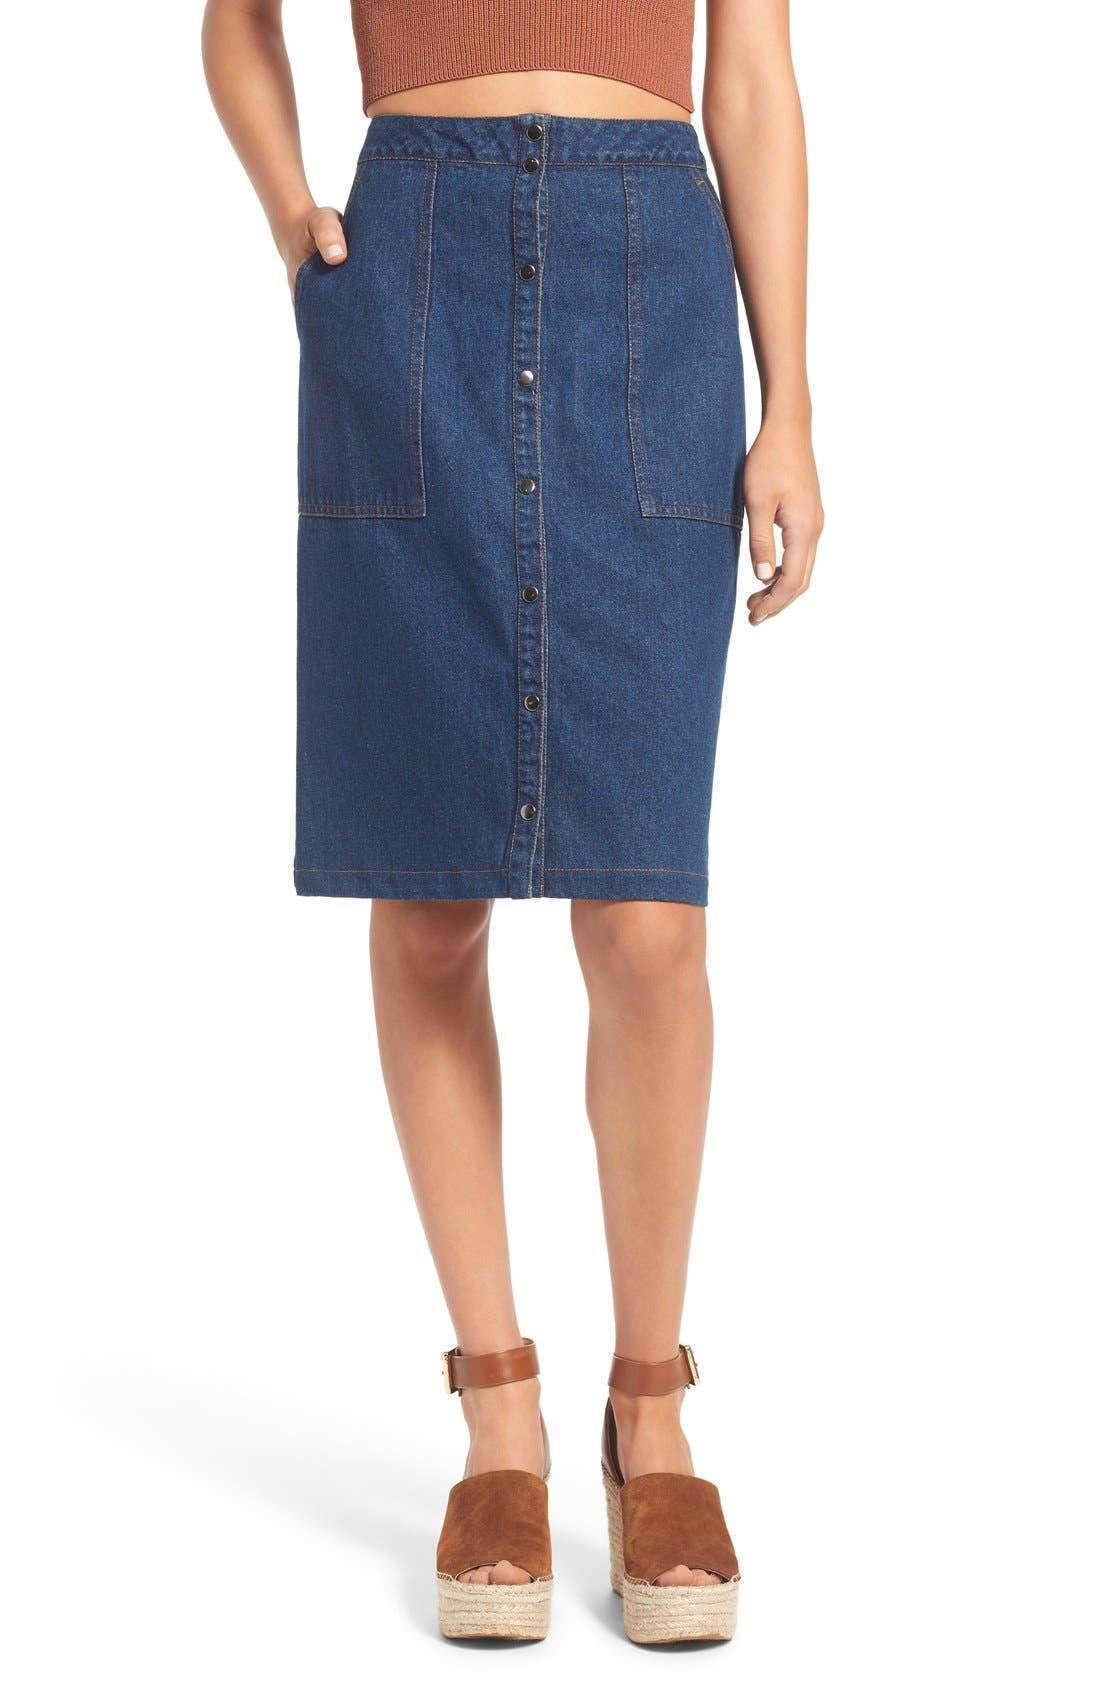 Alternate Image 1 Selected - ASTR 'Francisca' Button Front Denim Skirt